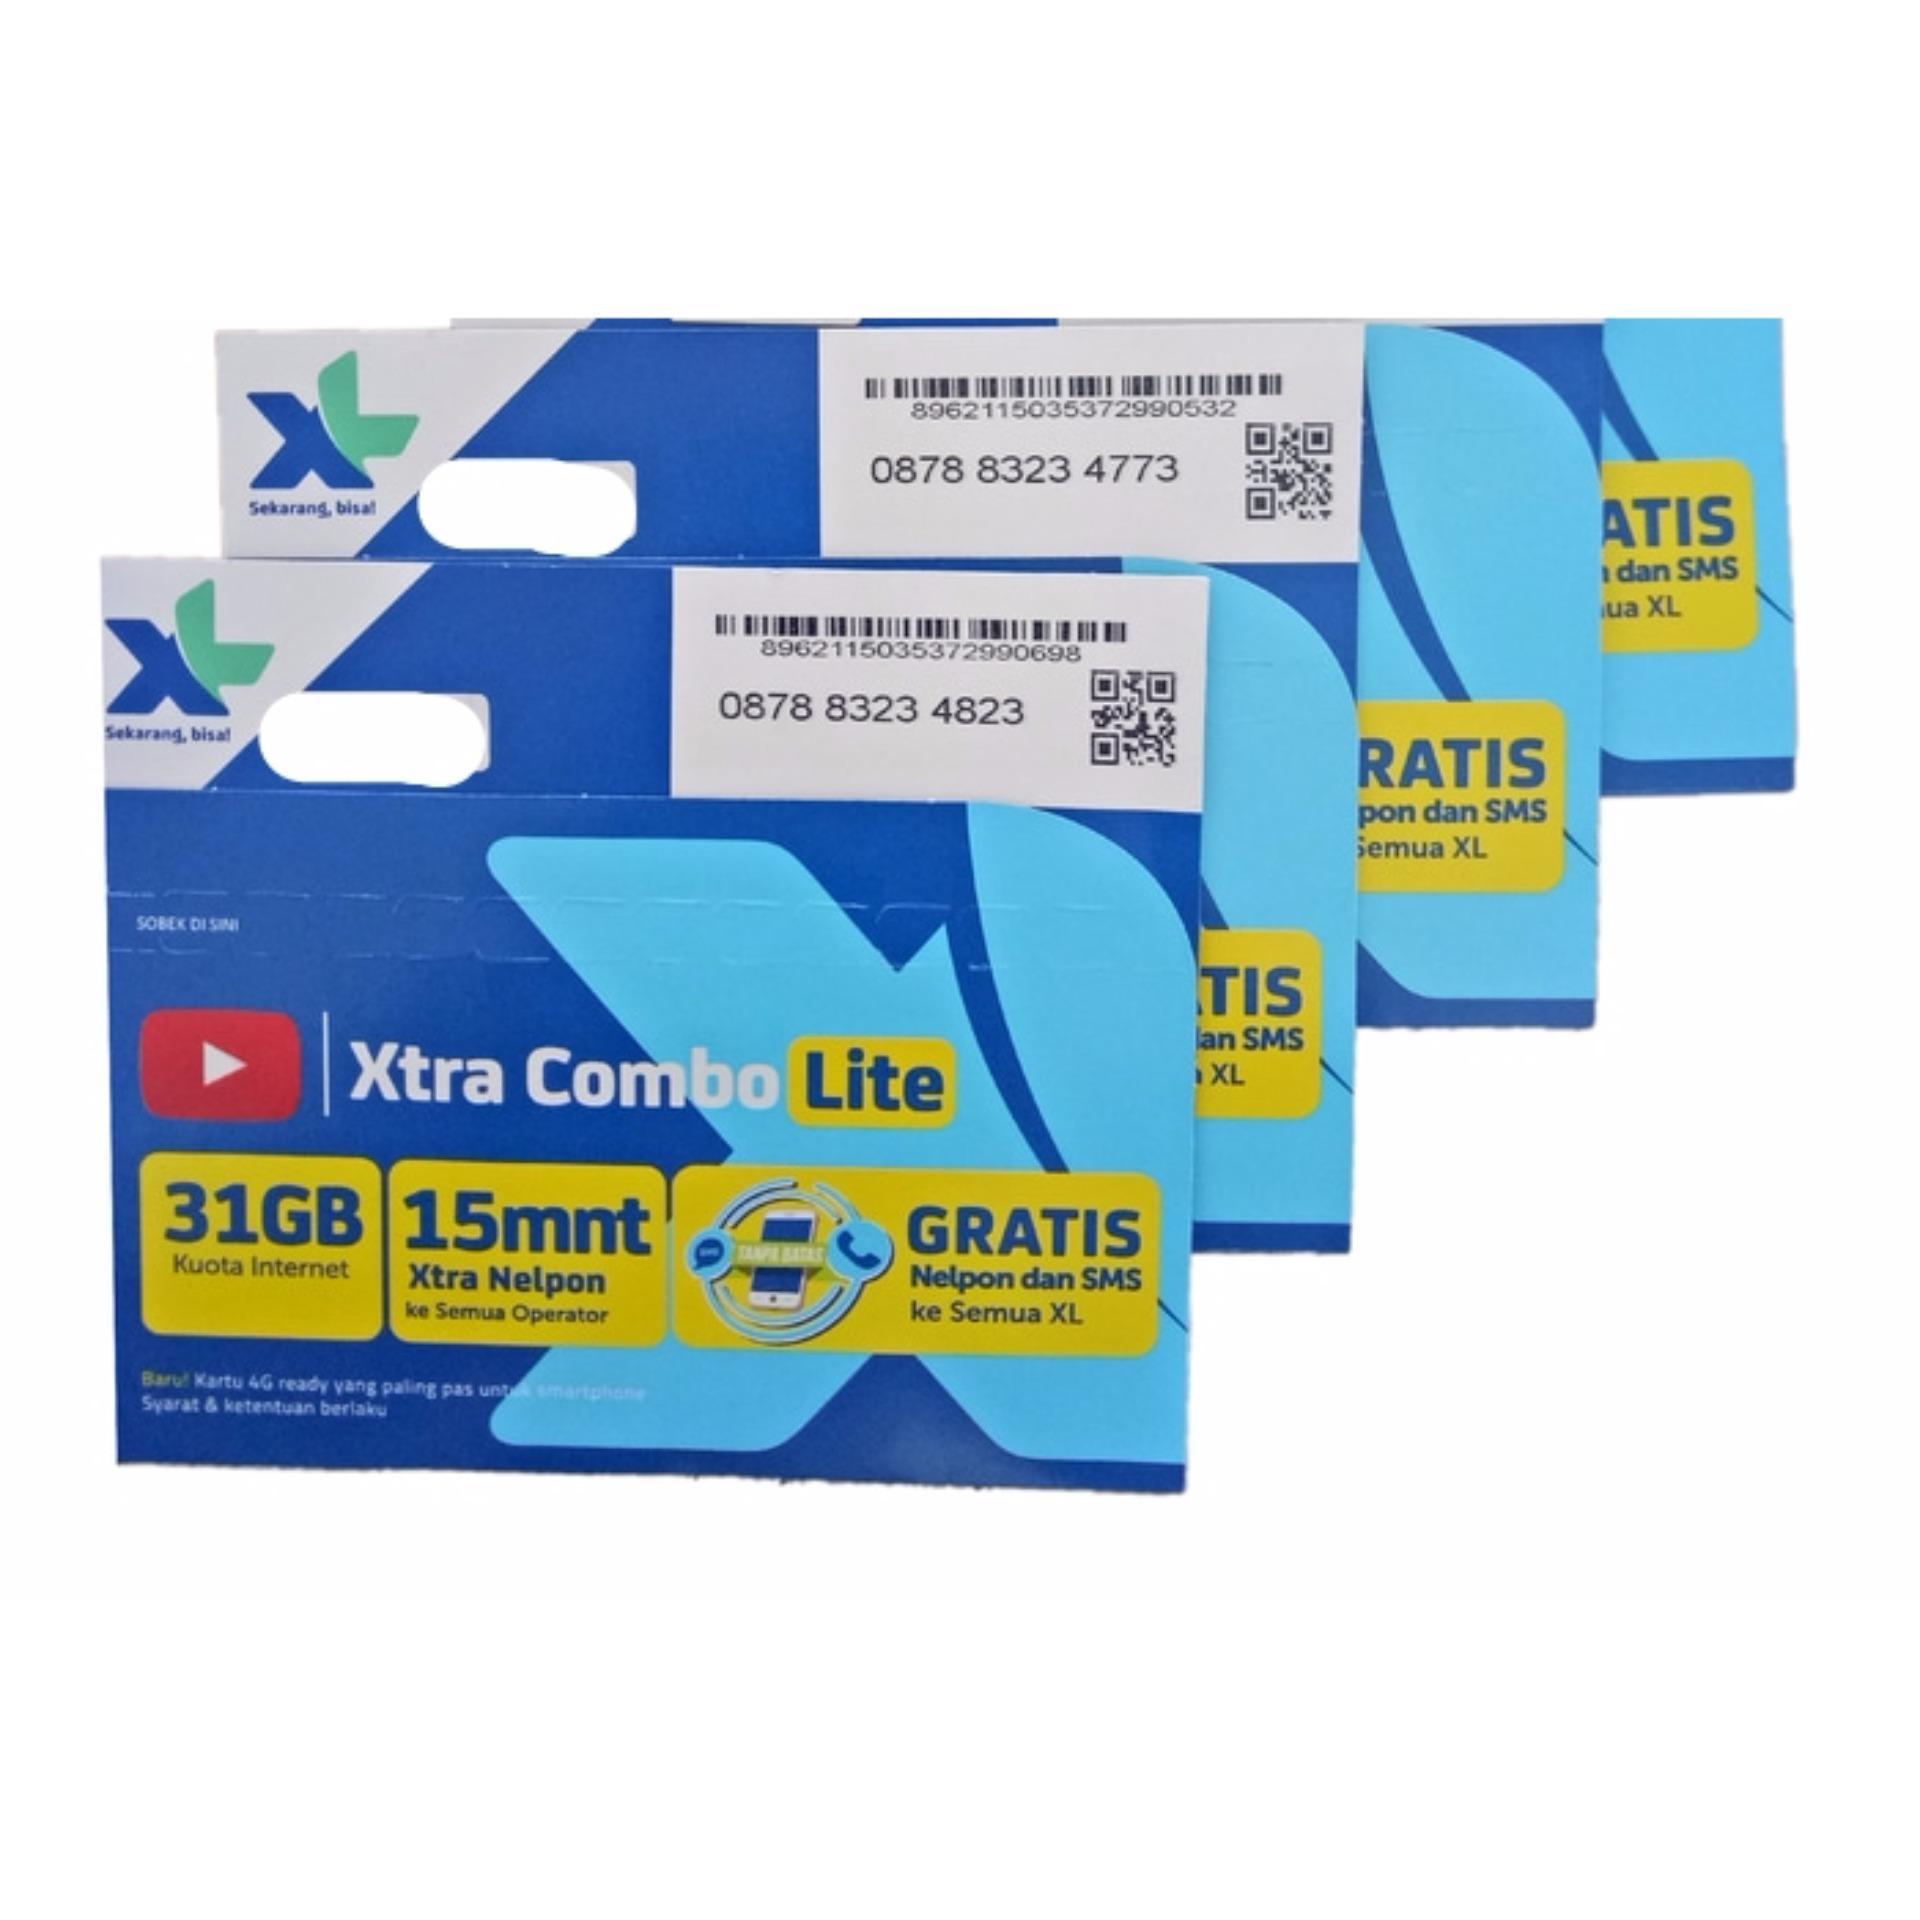 Review Kartu Perdana Internet Xl 31Gb Xl Combo Xtra